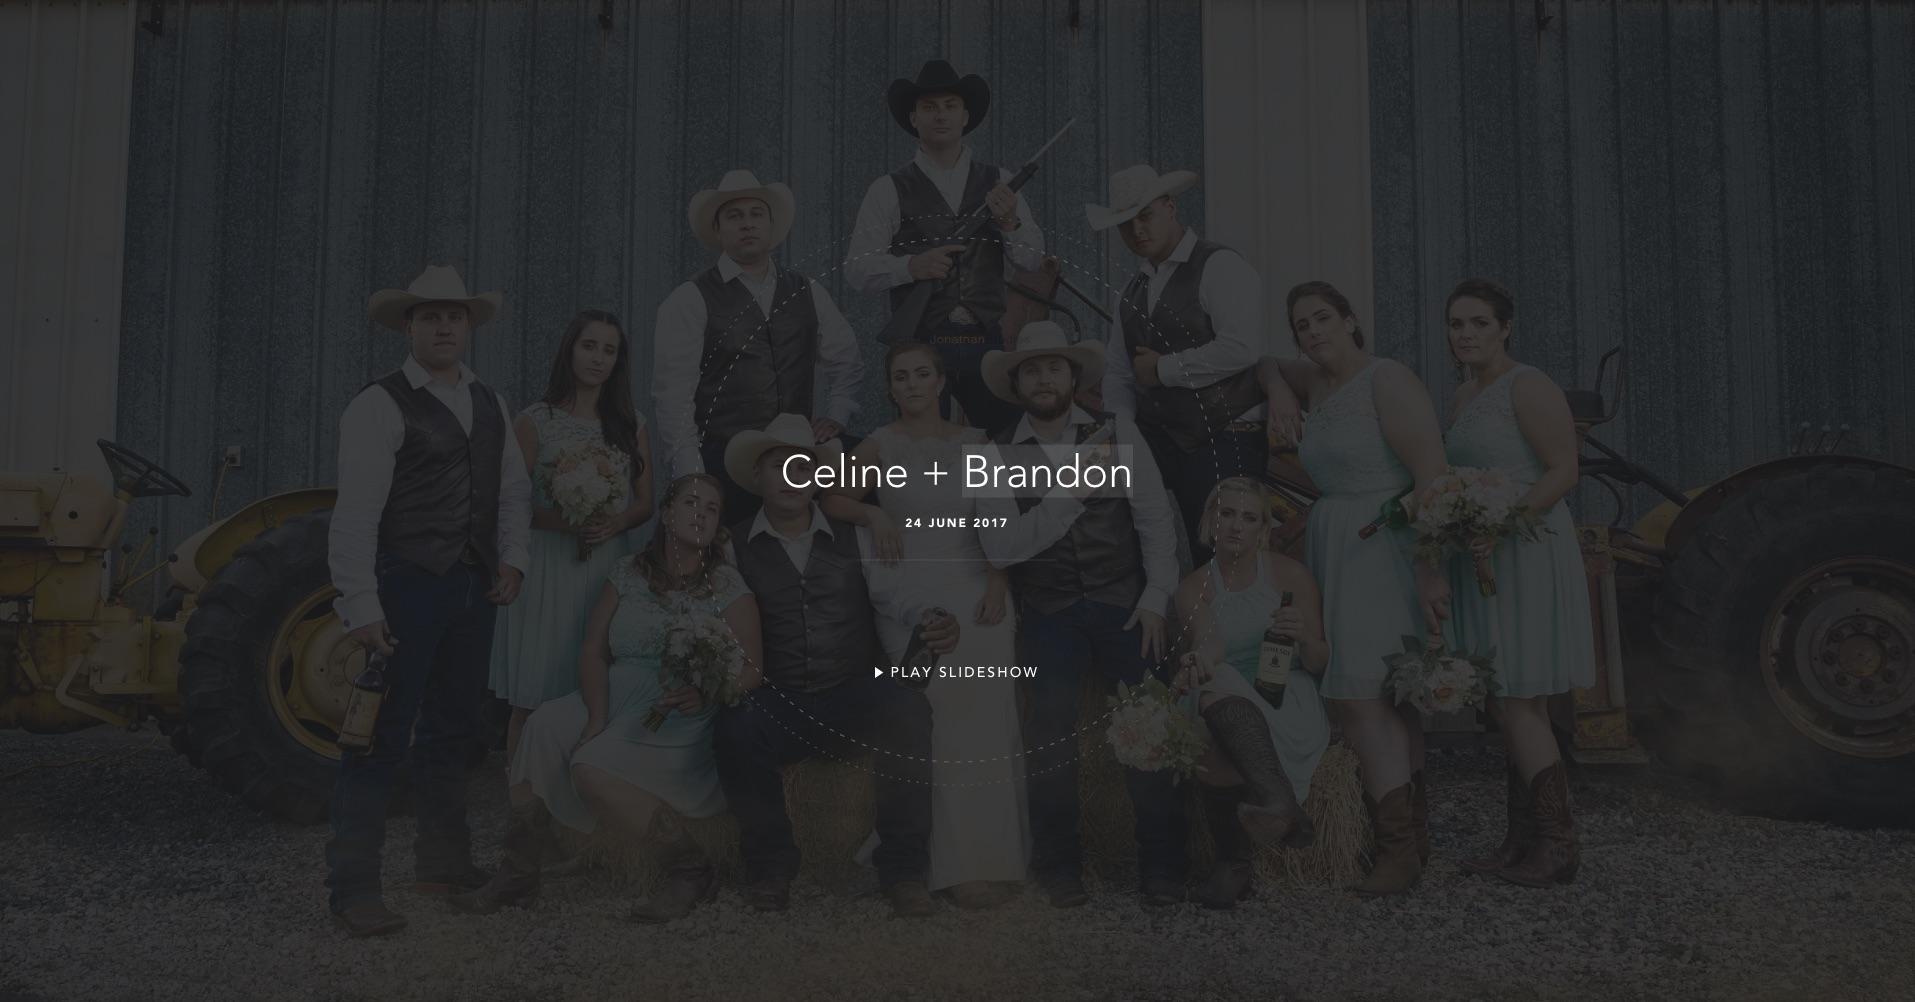 Celine + Brandon